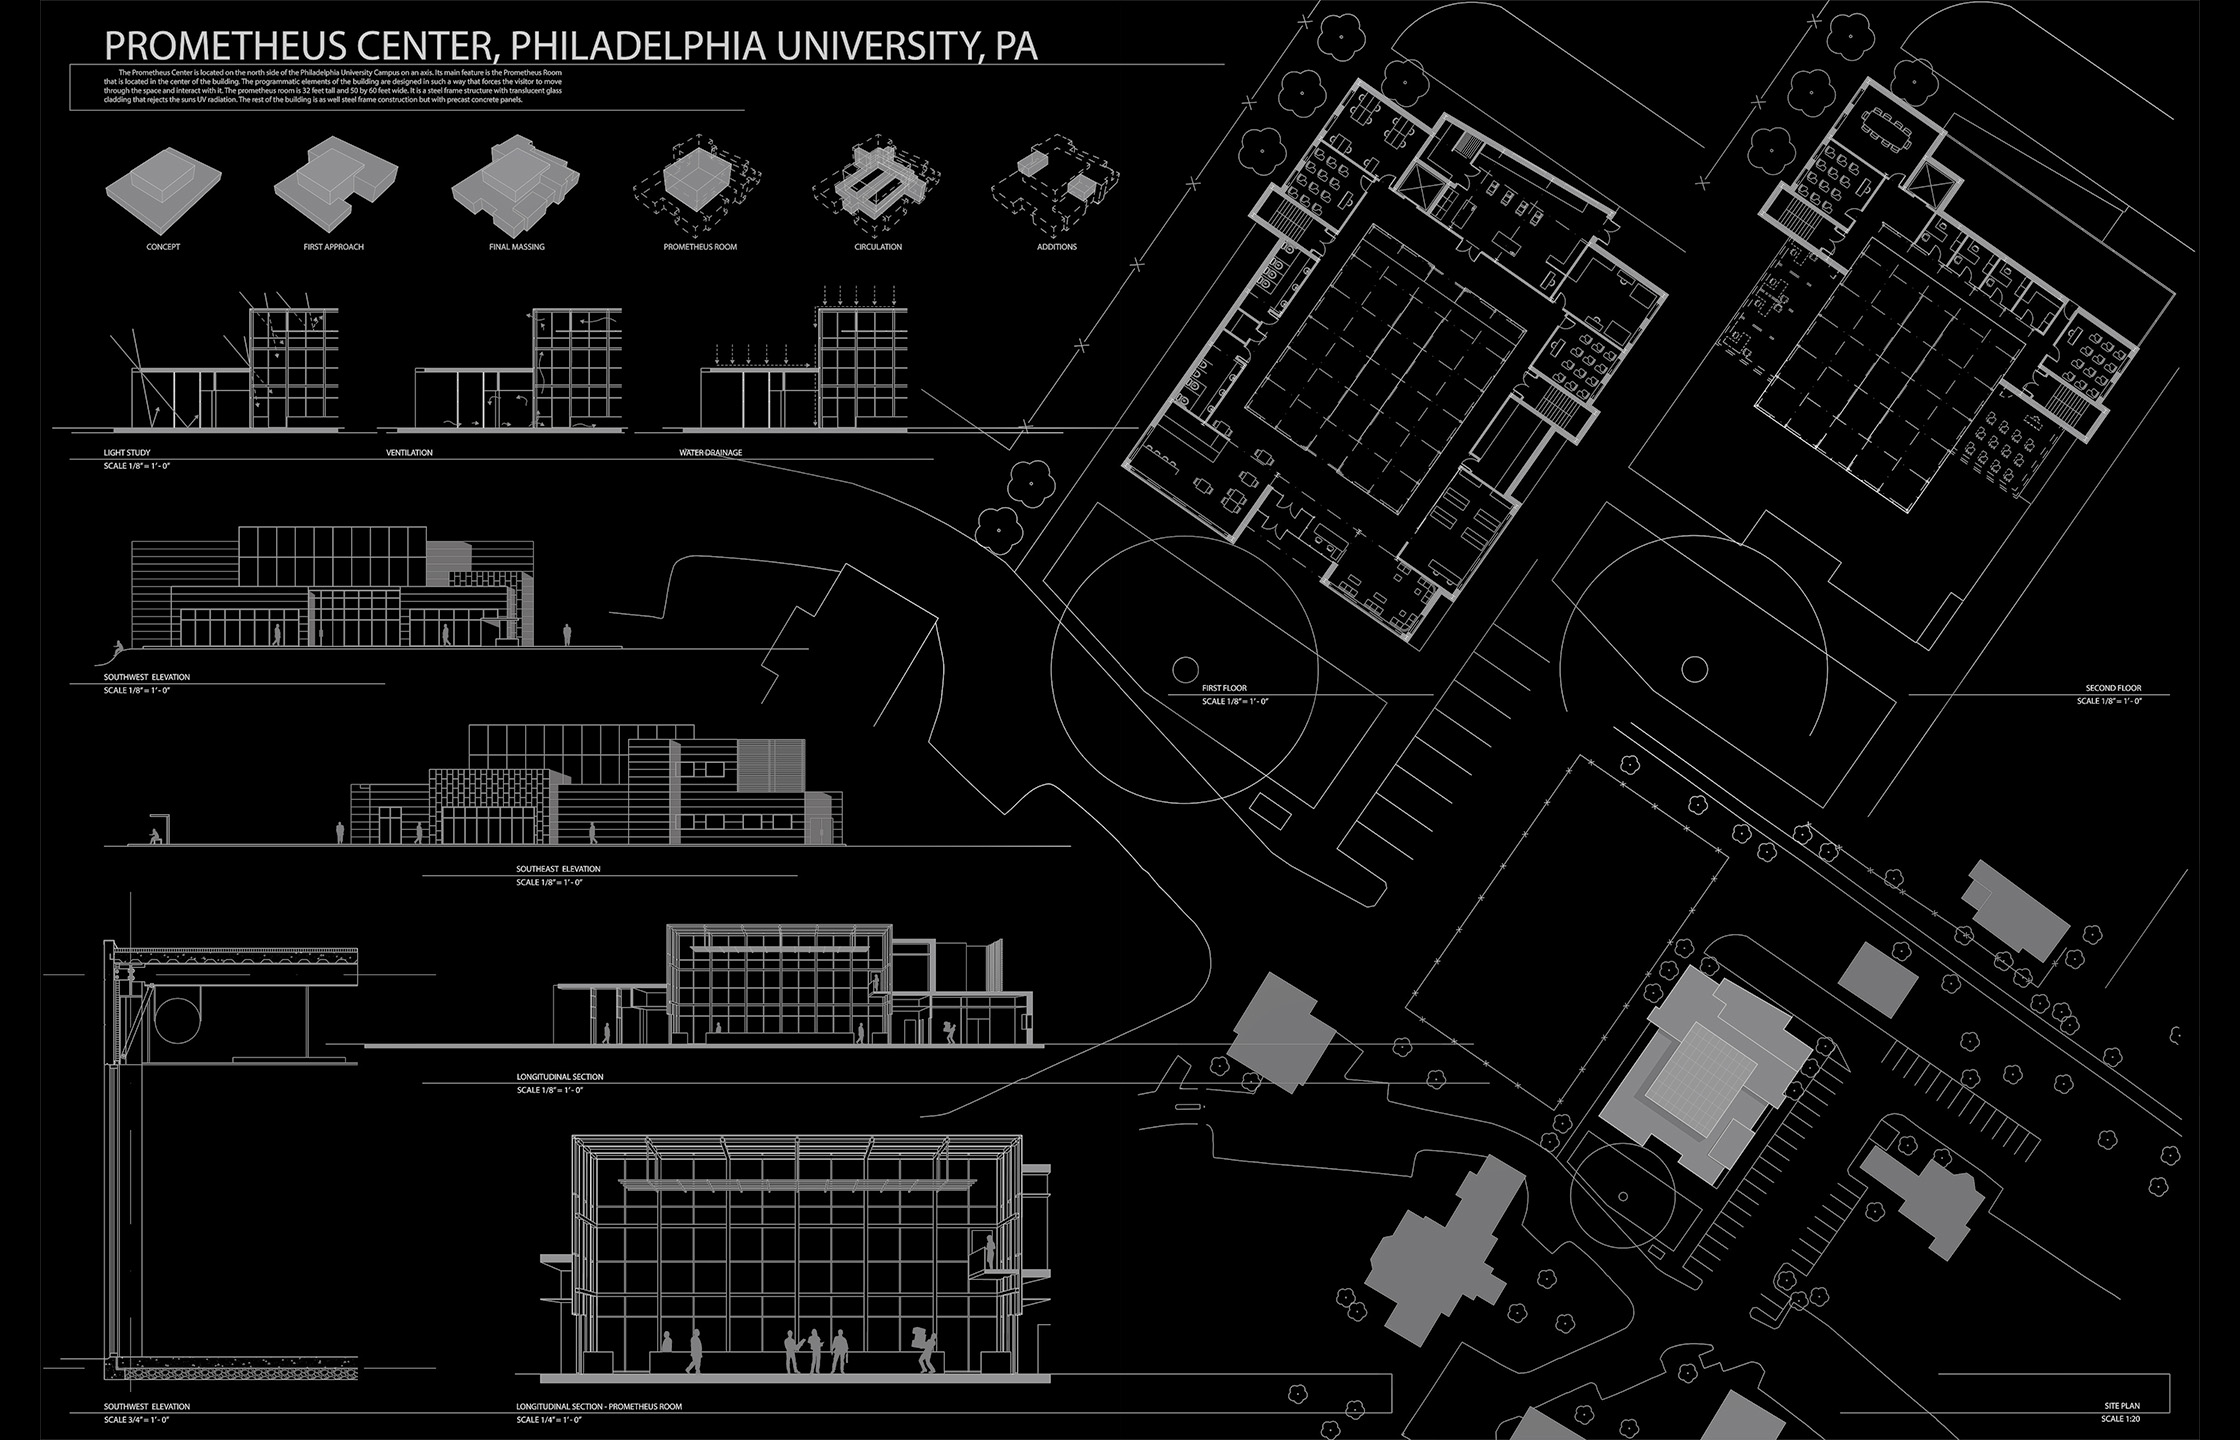 Prometheus Center